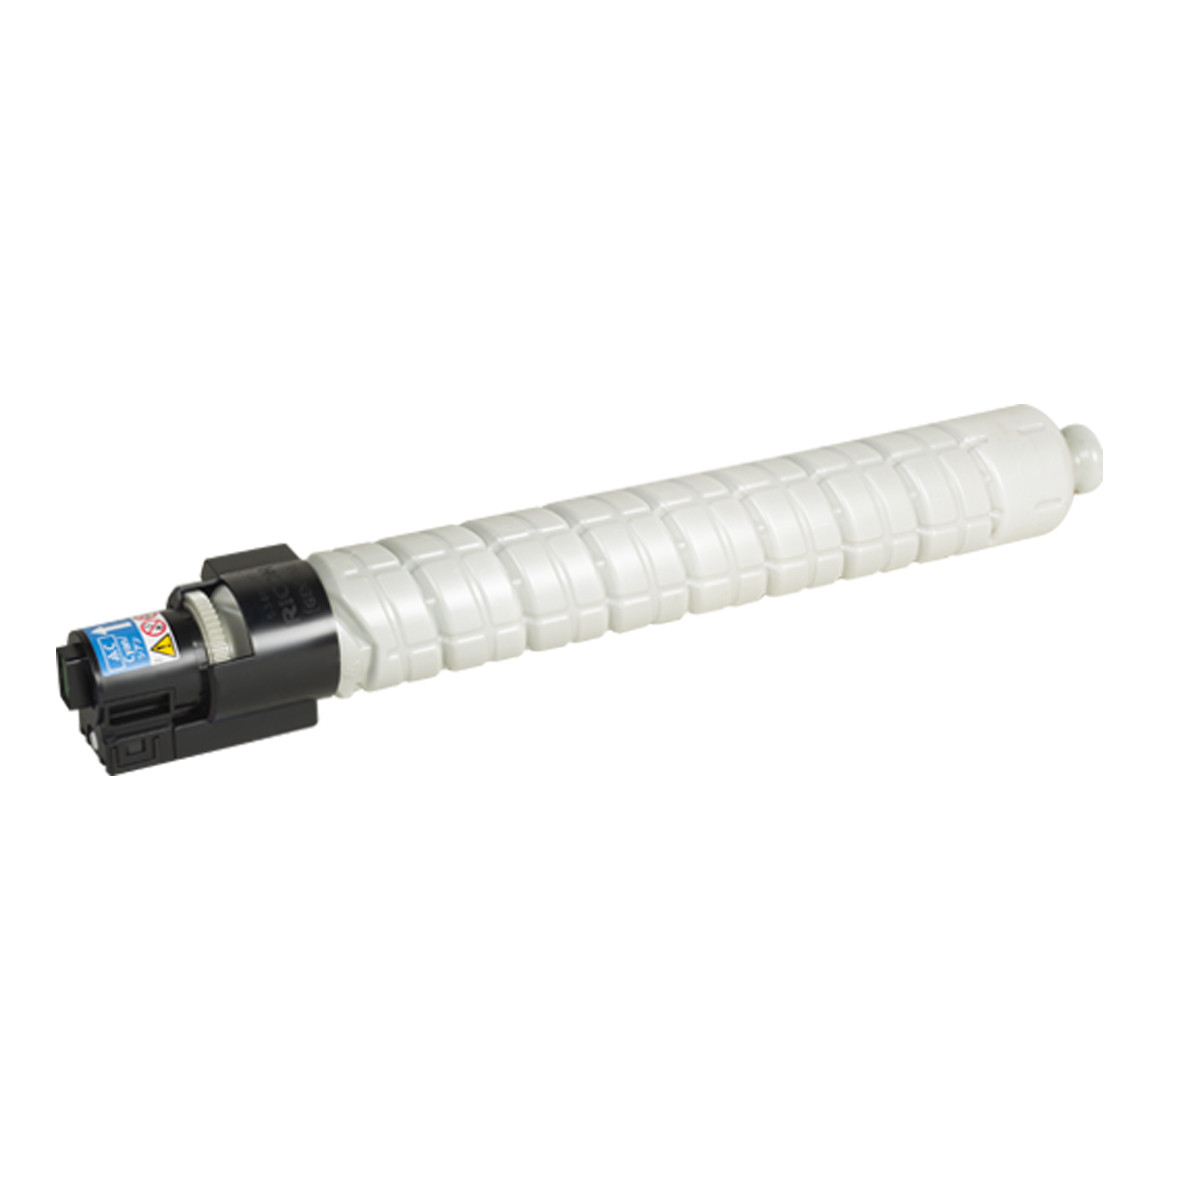 Toner Compatível com Ricoh 842310 Ciano   MPC2000 MPC2500 MPC3000   Zeus 10.5k